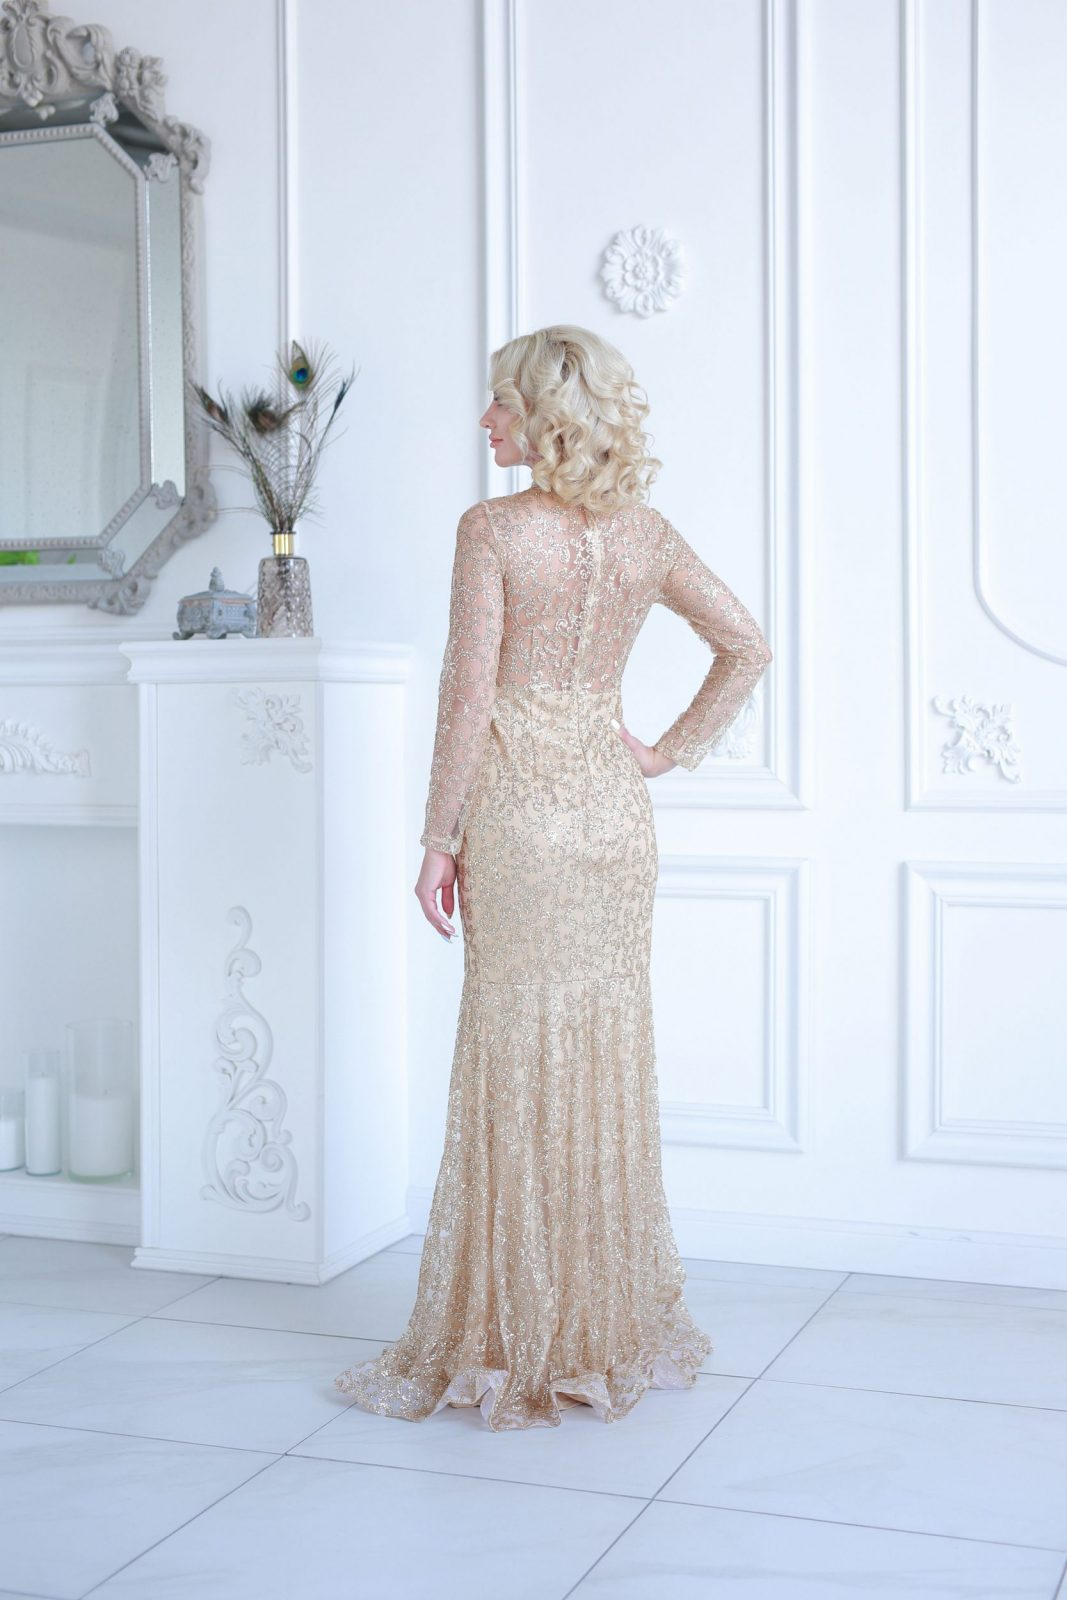 Leila Gold